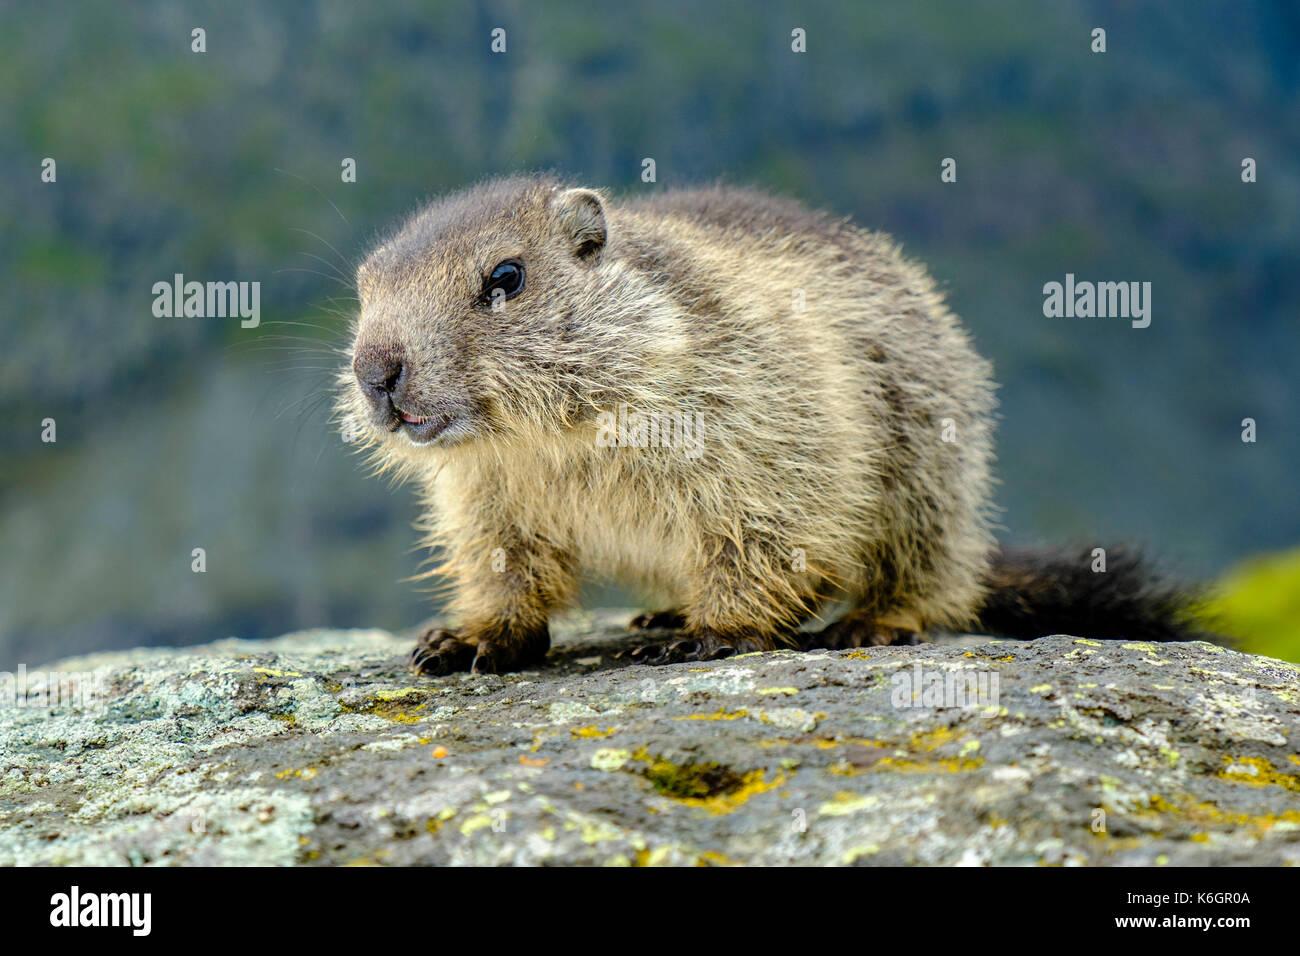 A baby Alpine marmot (Marmota marmota) is walking on a rock at Kaiser-Franz-Josefs-Höhe - Stock Image